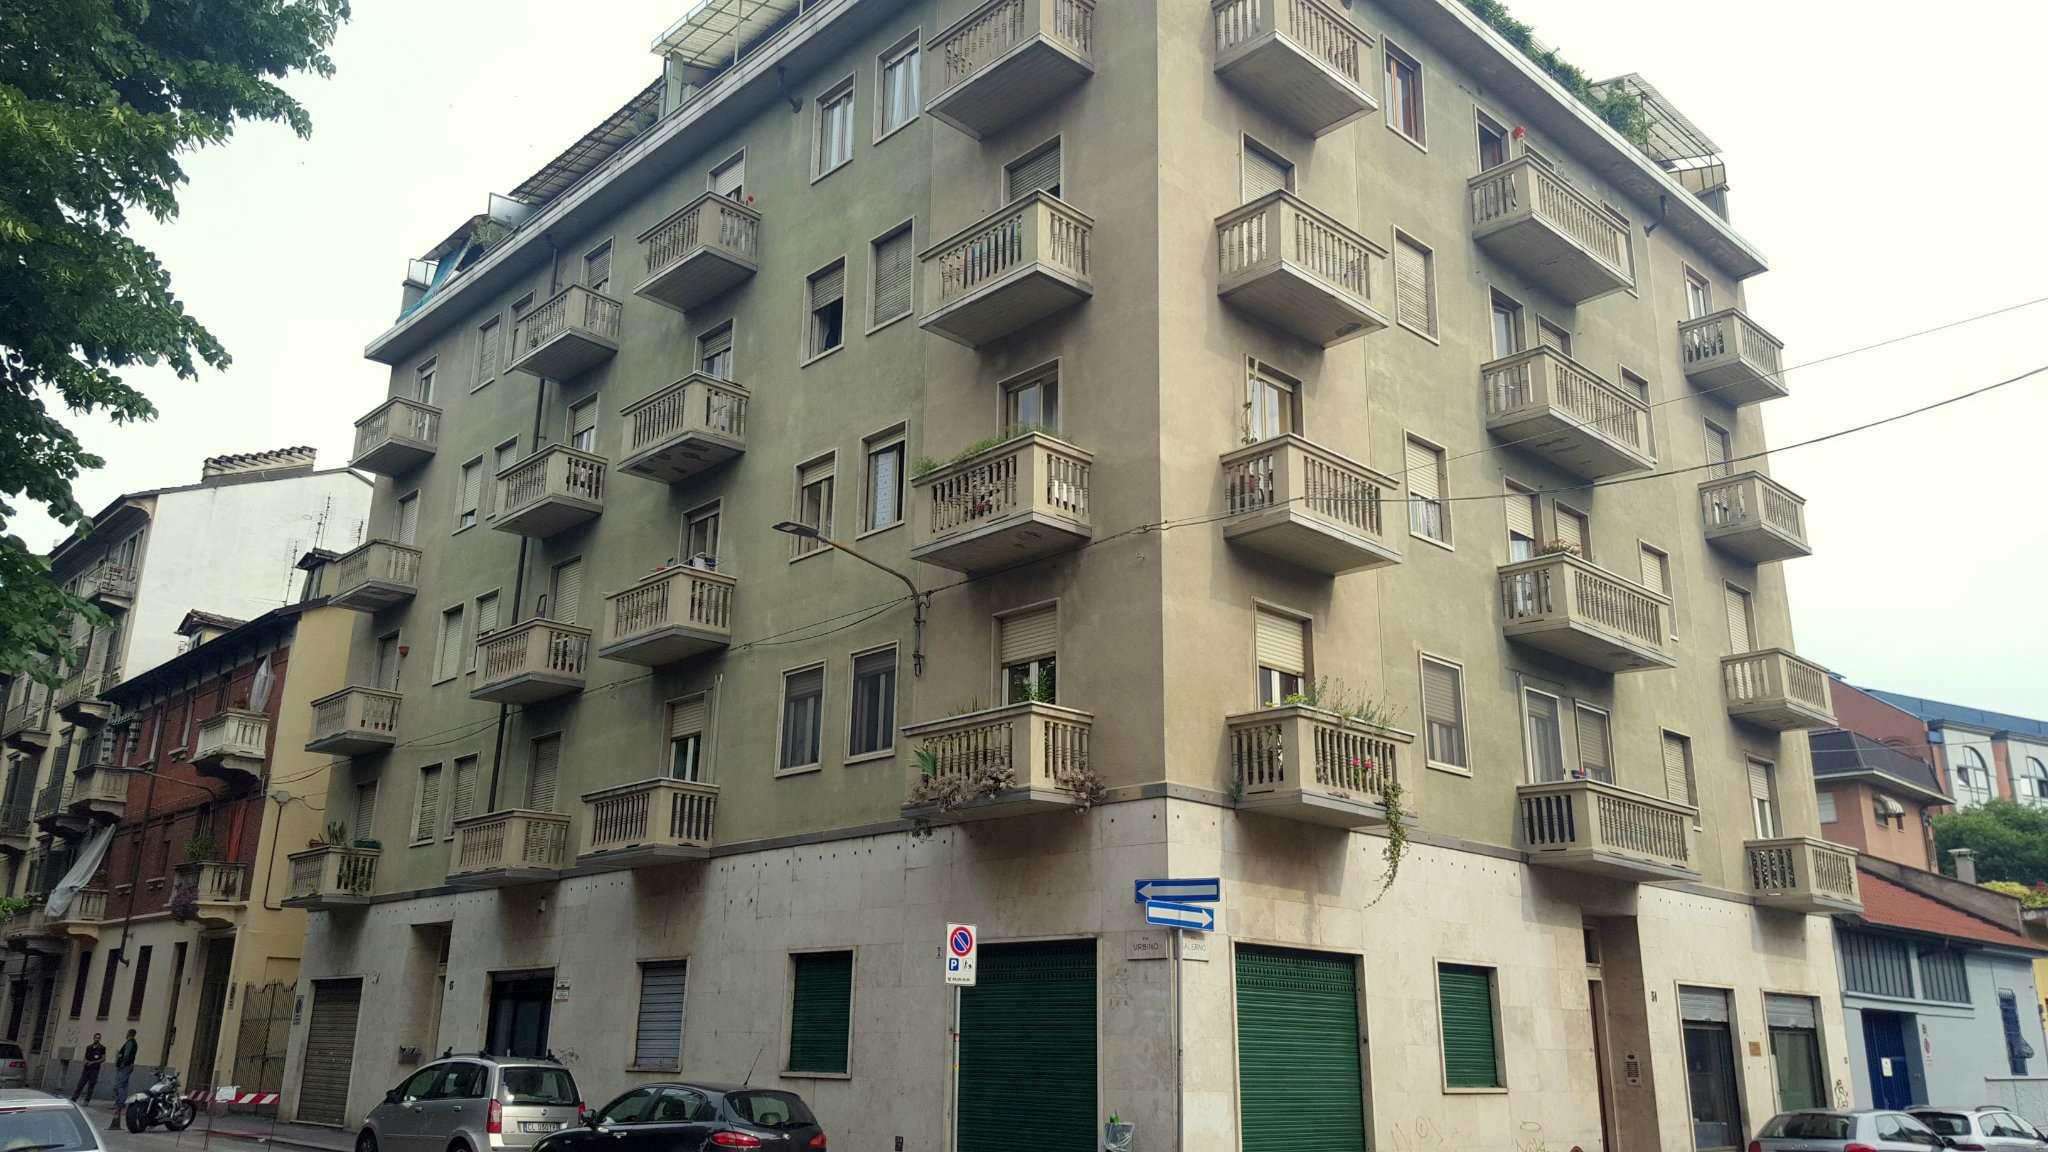 Negozio in vendita Zona Valdocco, Aurora - via Urbino 15 Torino